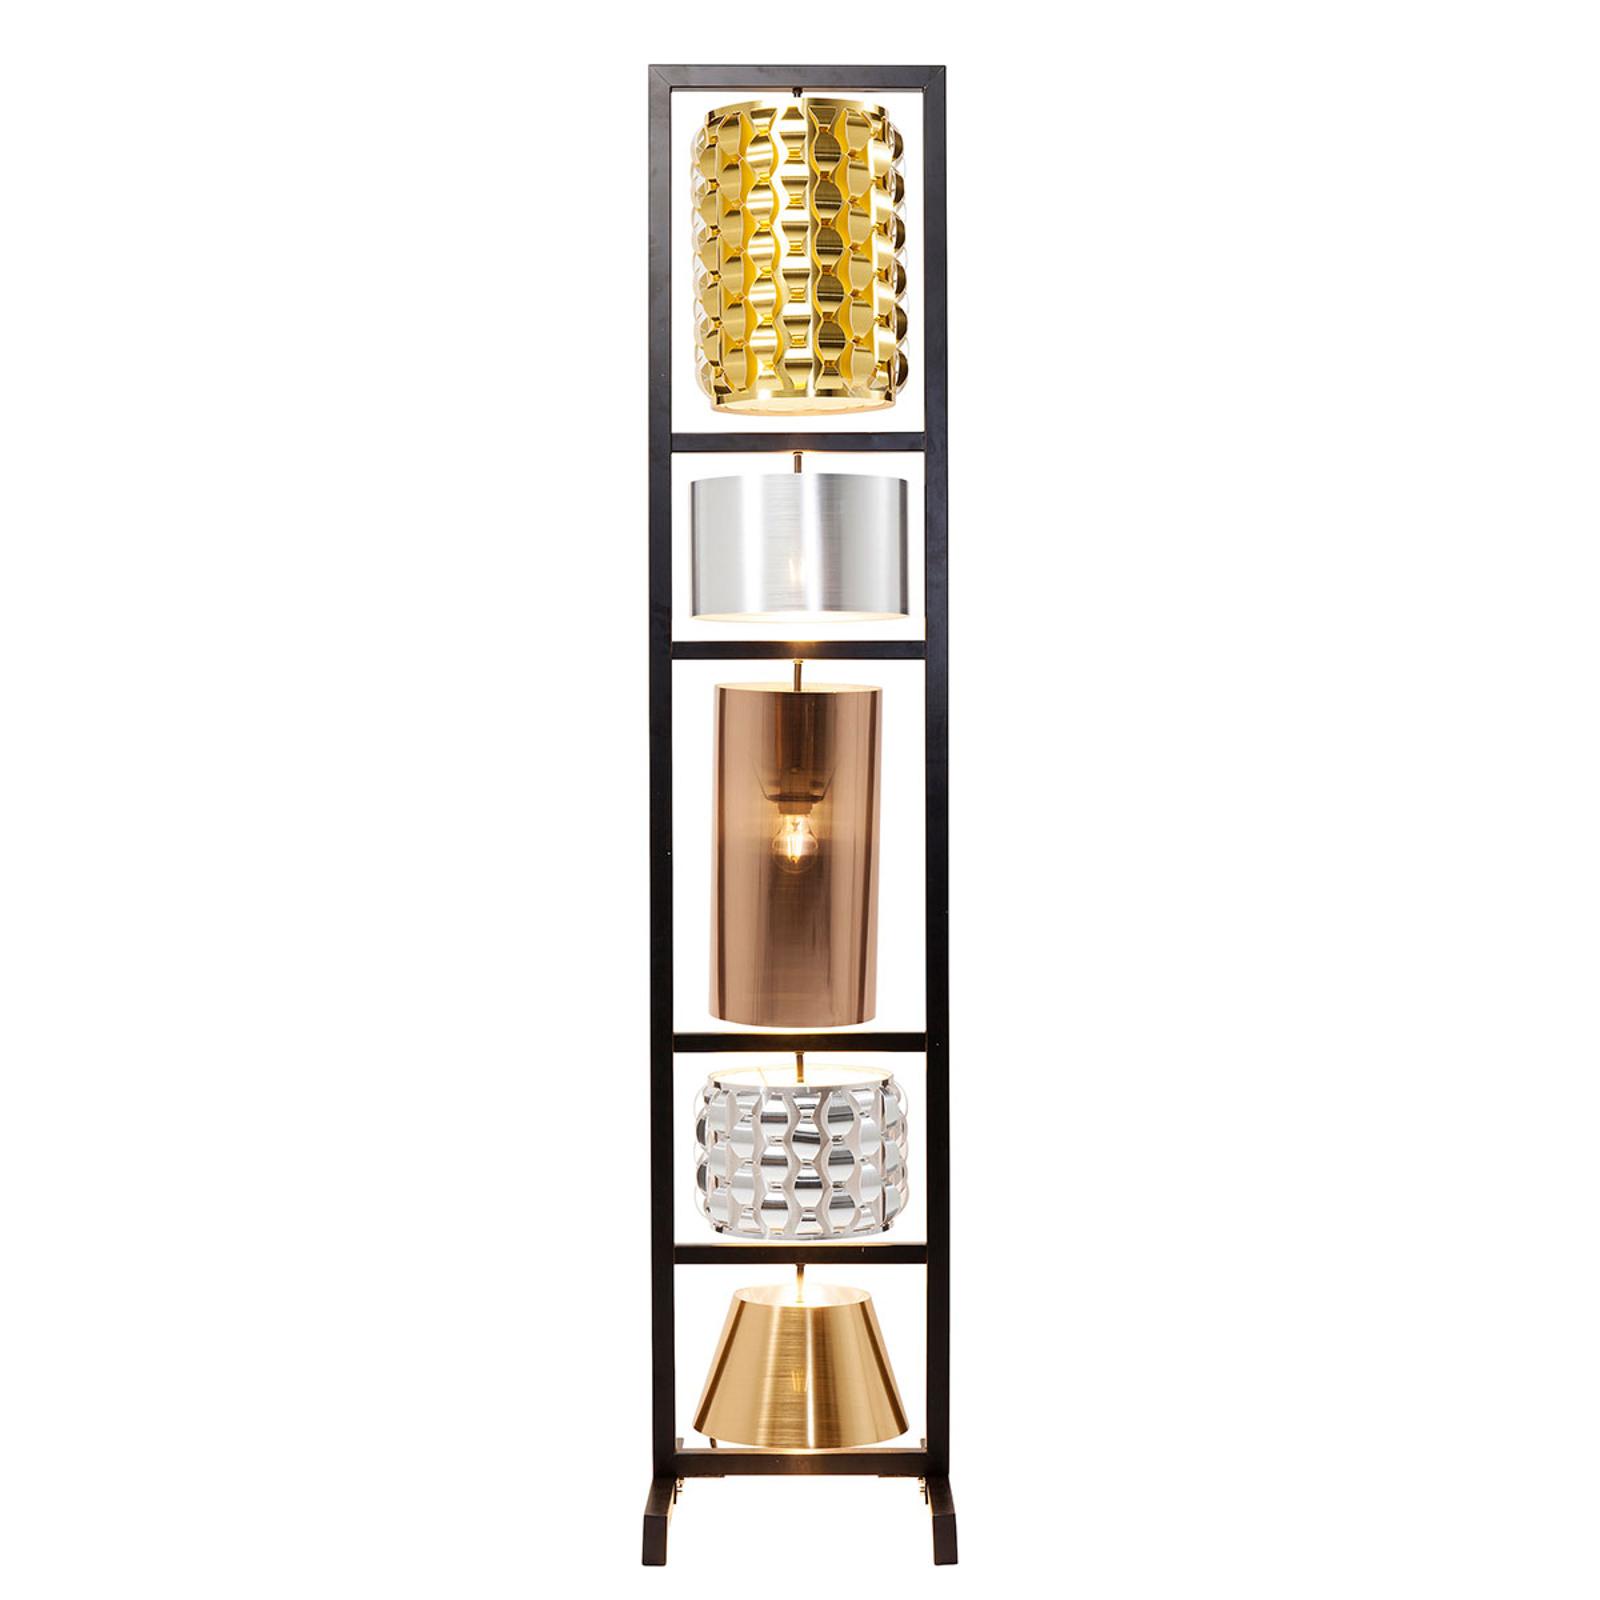 KARE Parecchi Glamour 5-lamps vloerlamp